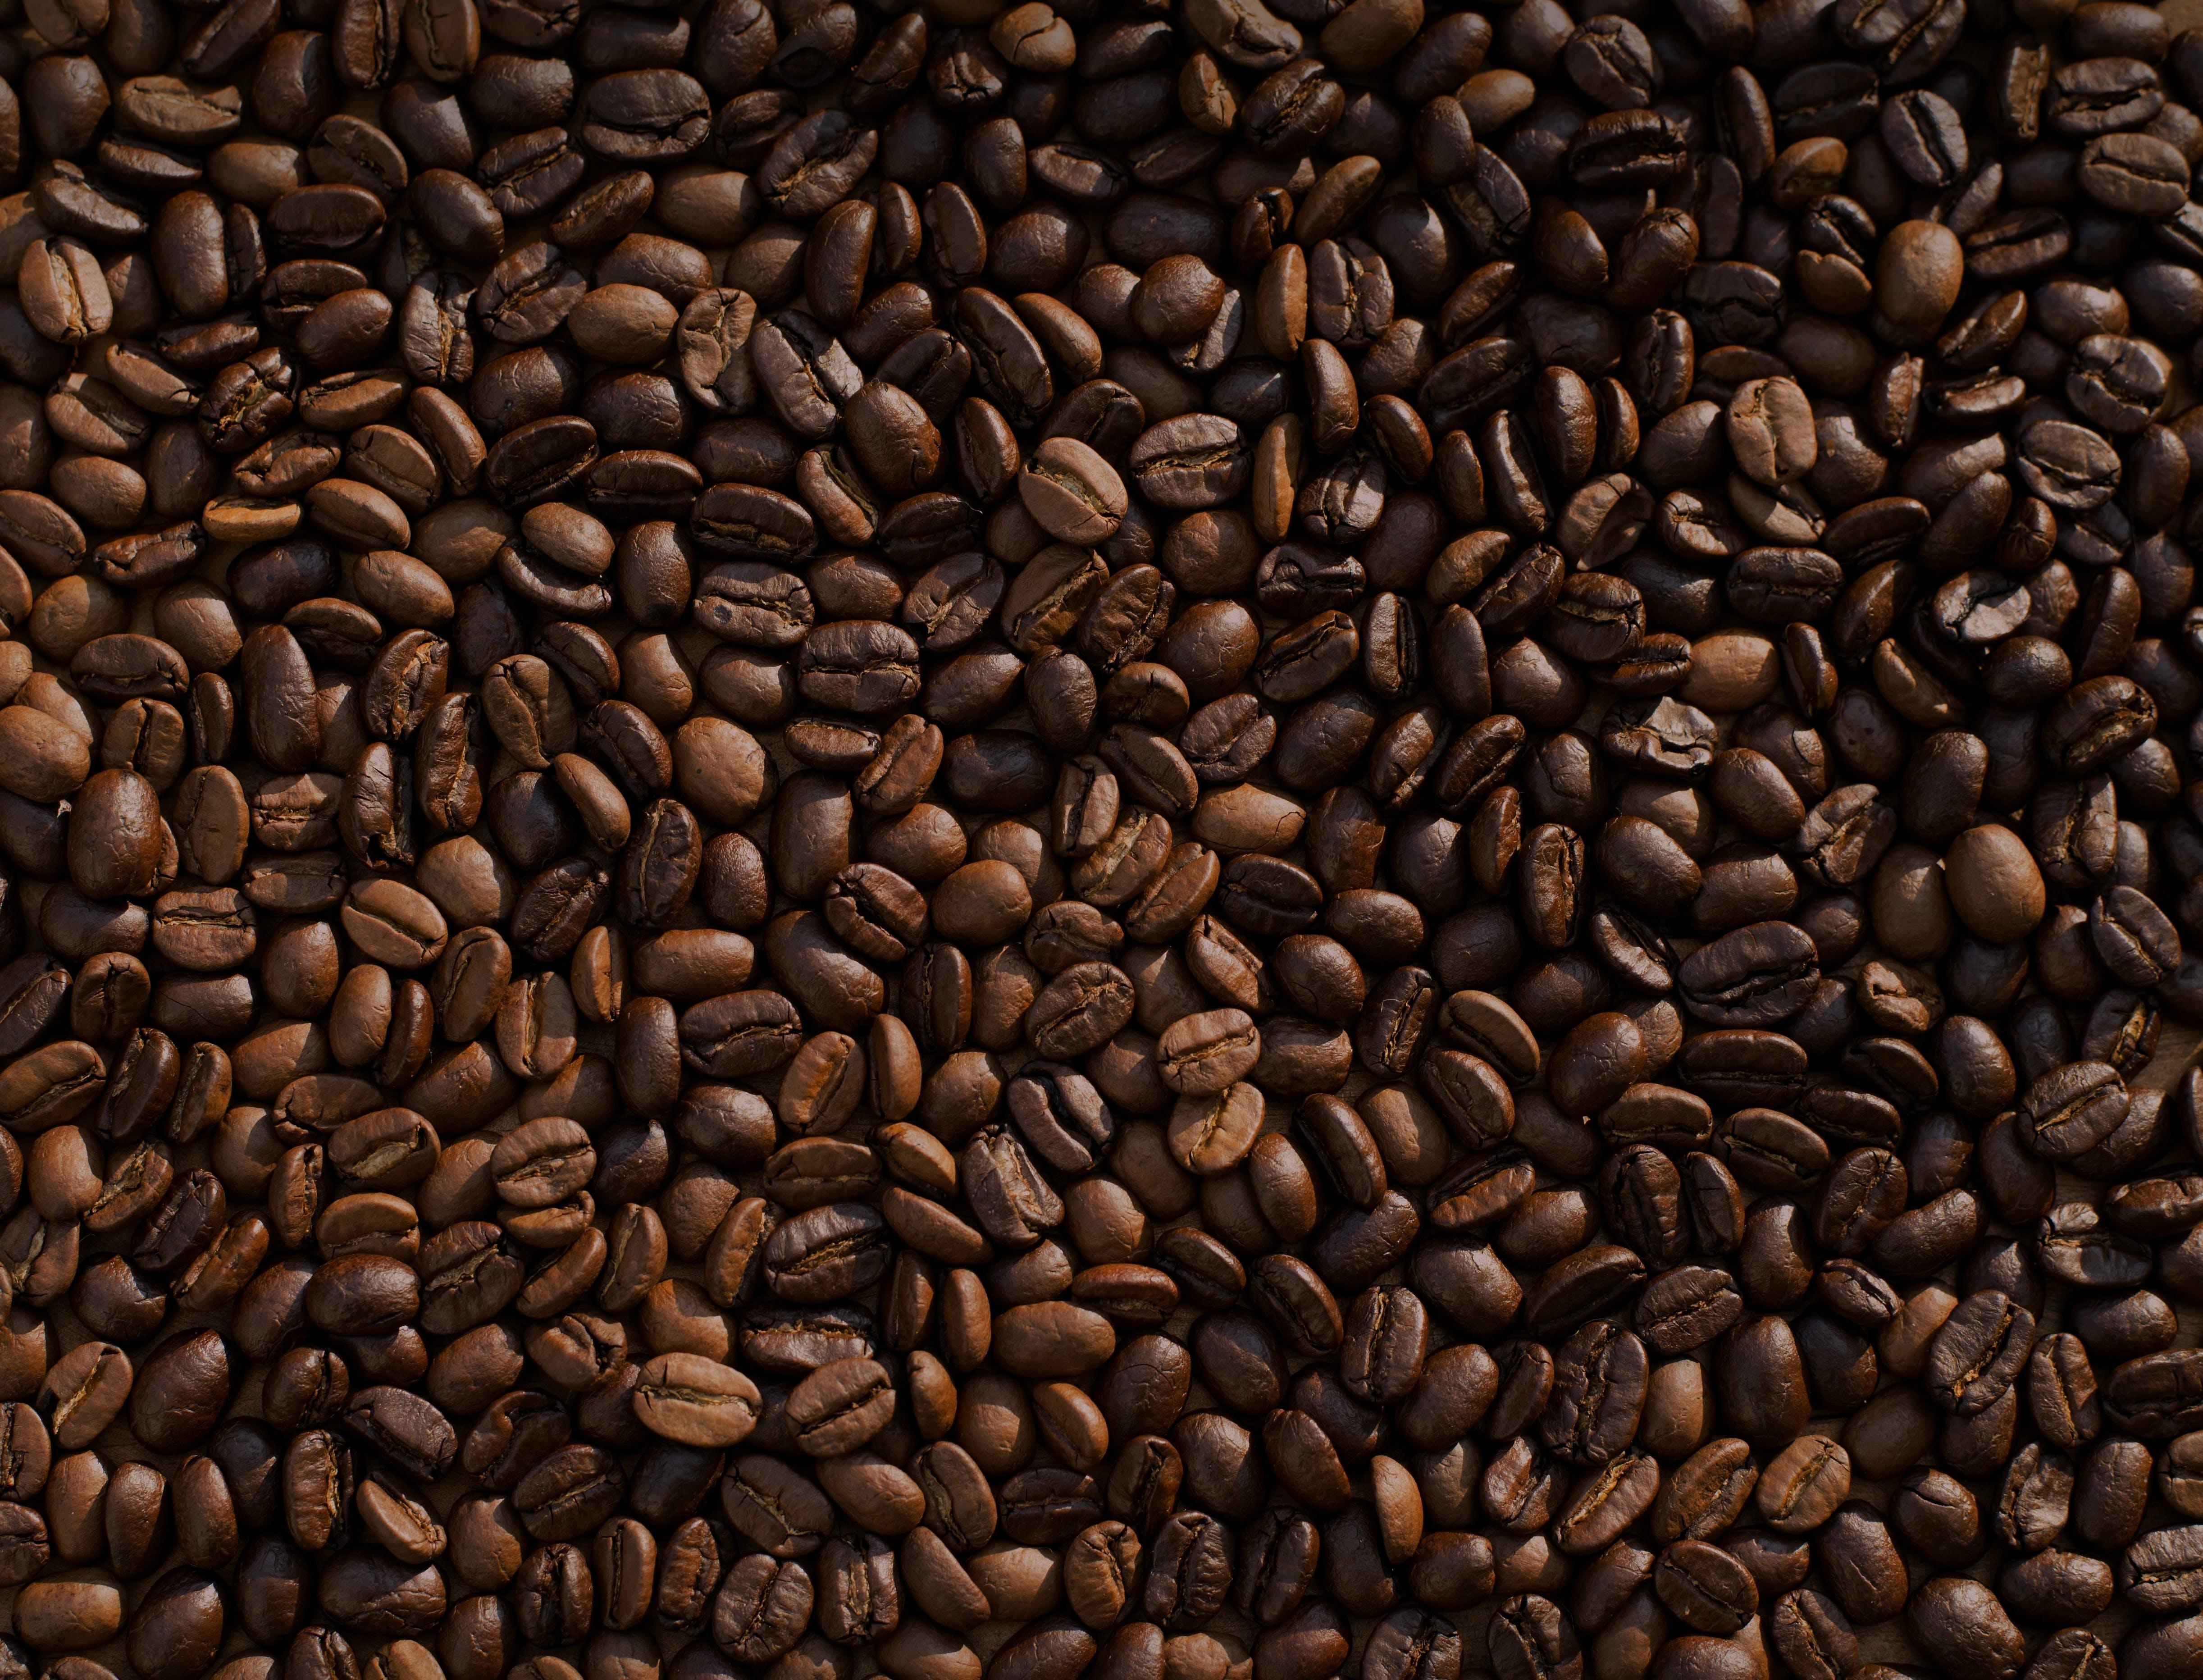 Free stock photo of beans, coffee, dark, brown